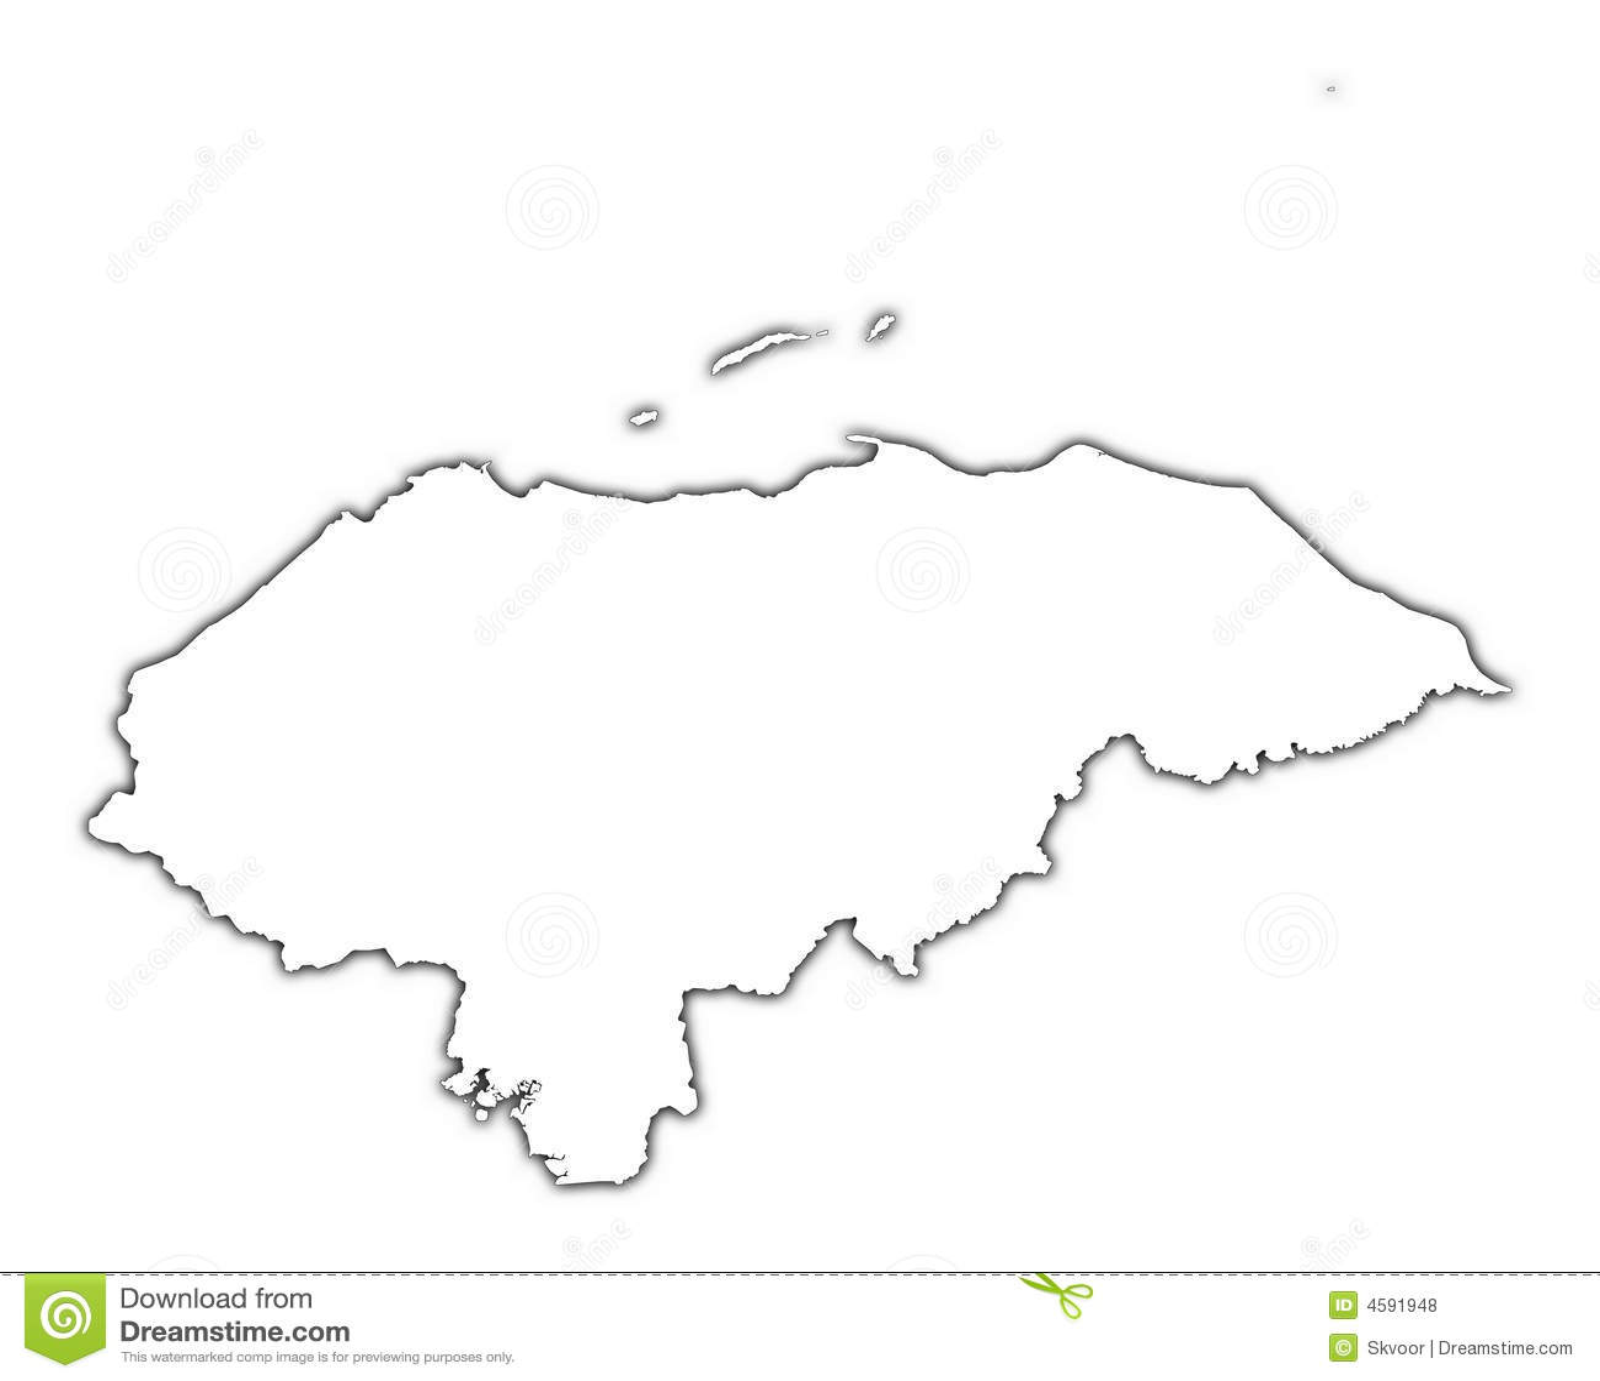 Honduras Outline Map Royalty Free Stock Photos Image - Honduras country political map